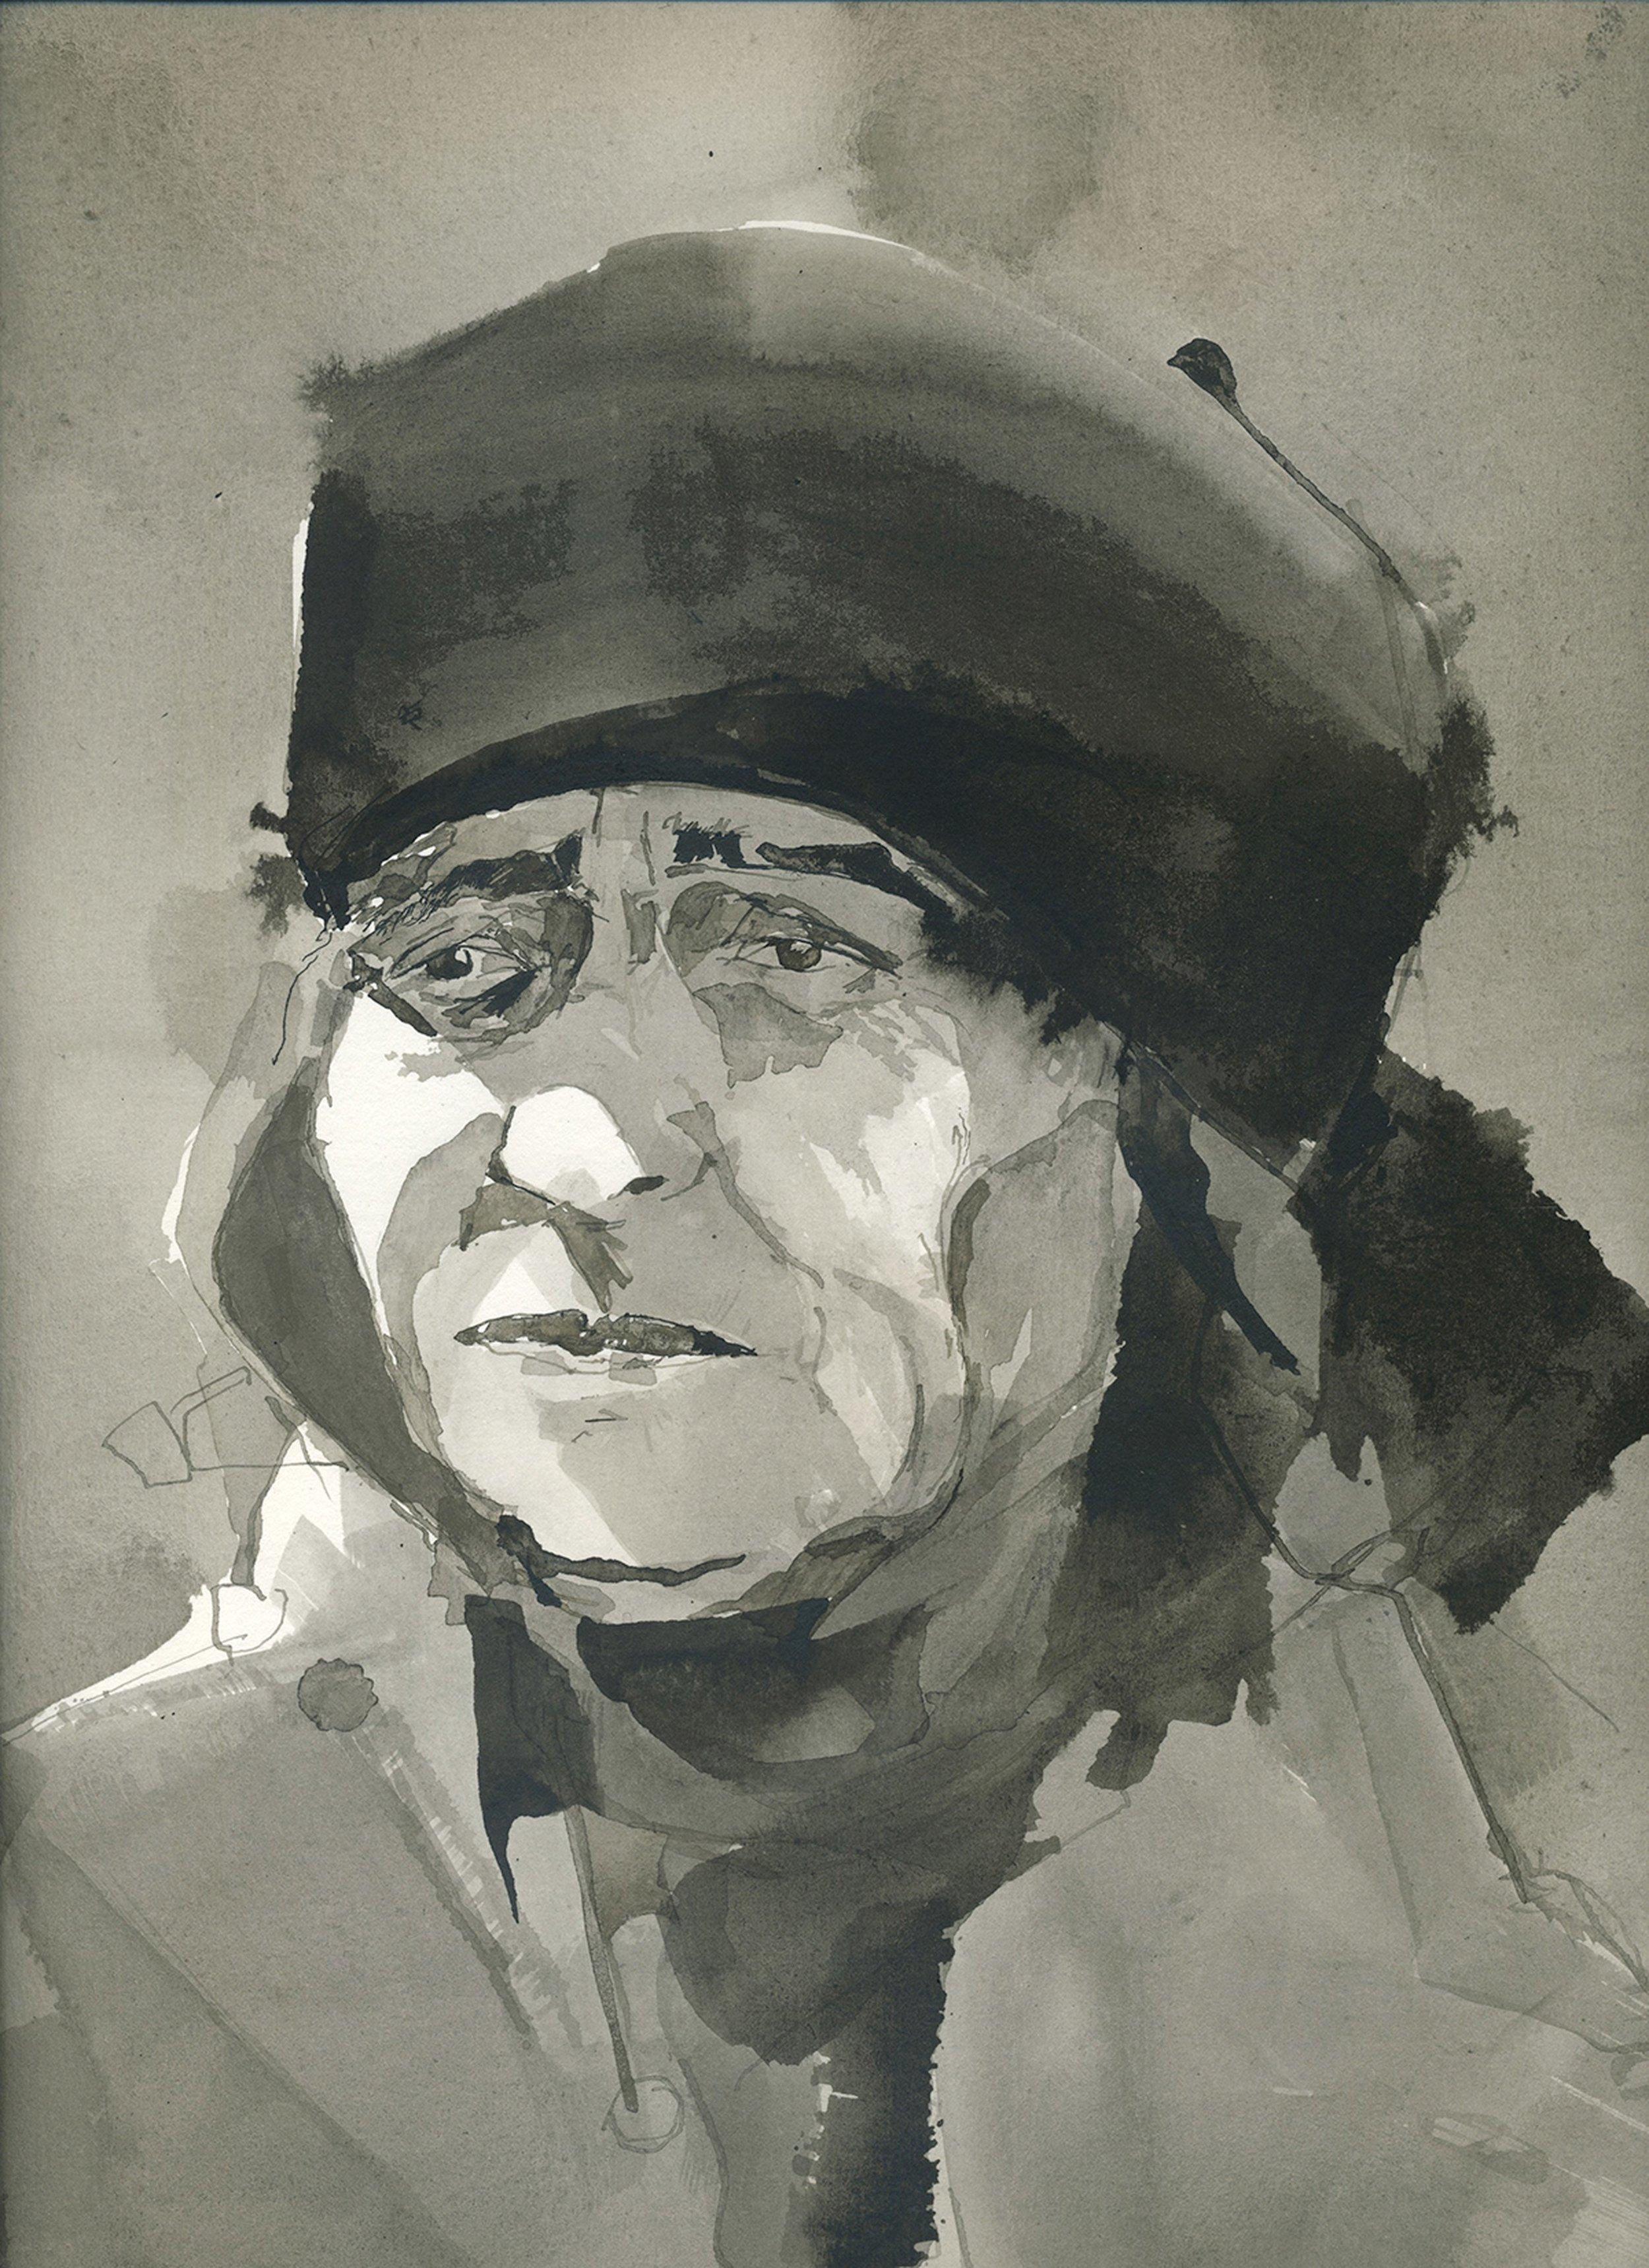 portrait-reportage-george-butler-illustration.jpg